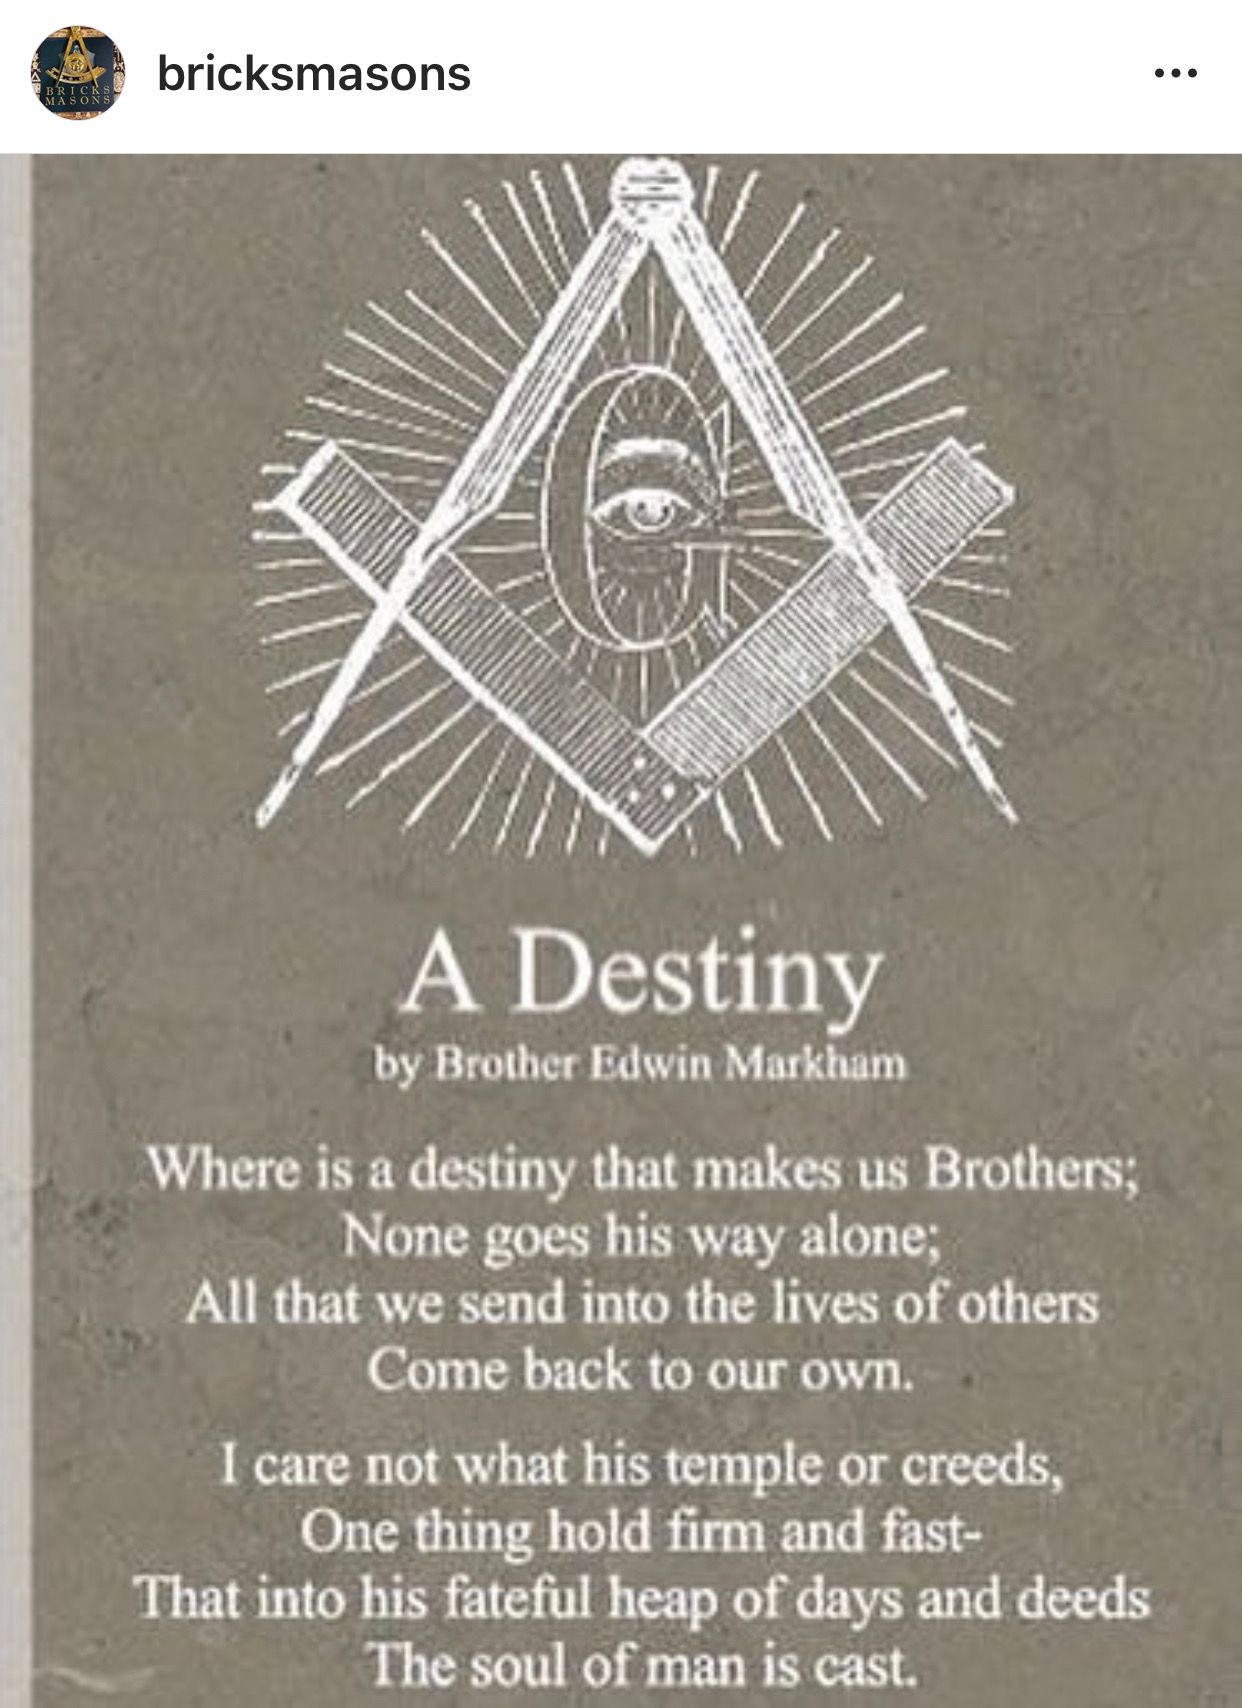 Pin by Jayfair Langford on Masons masonry Freemasonry